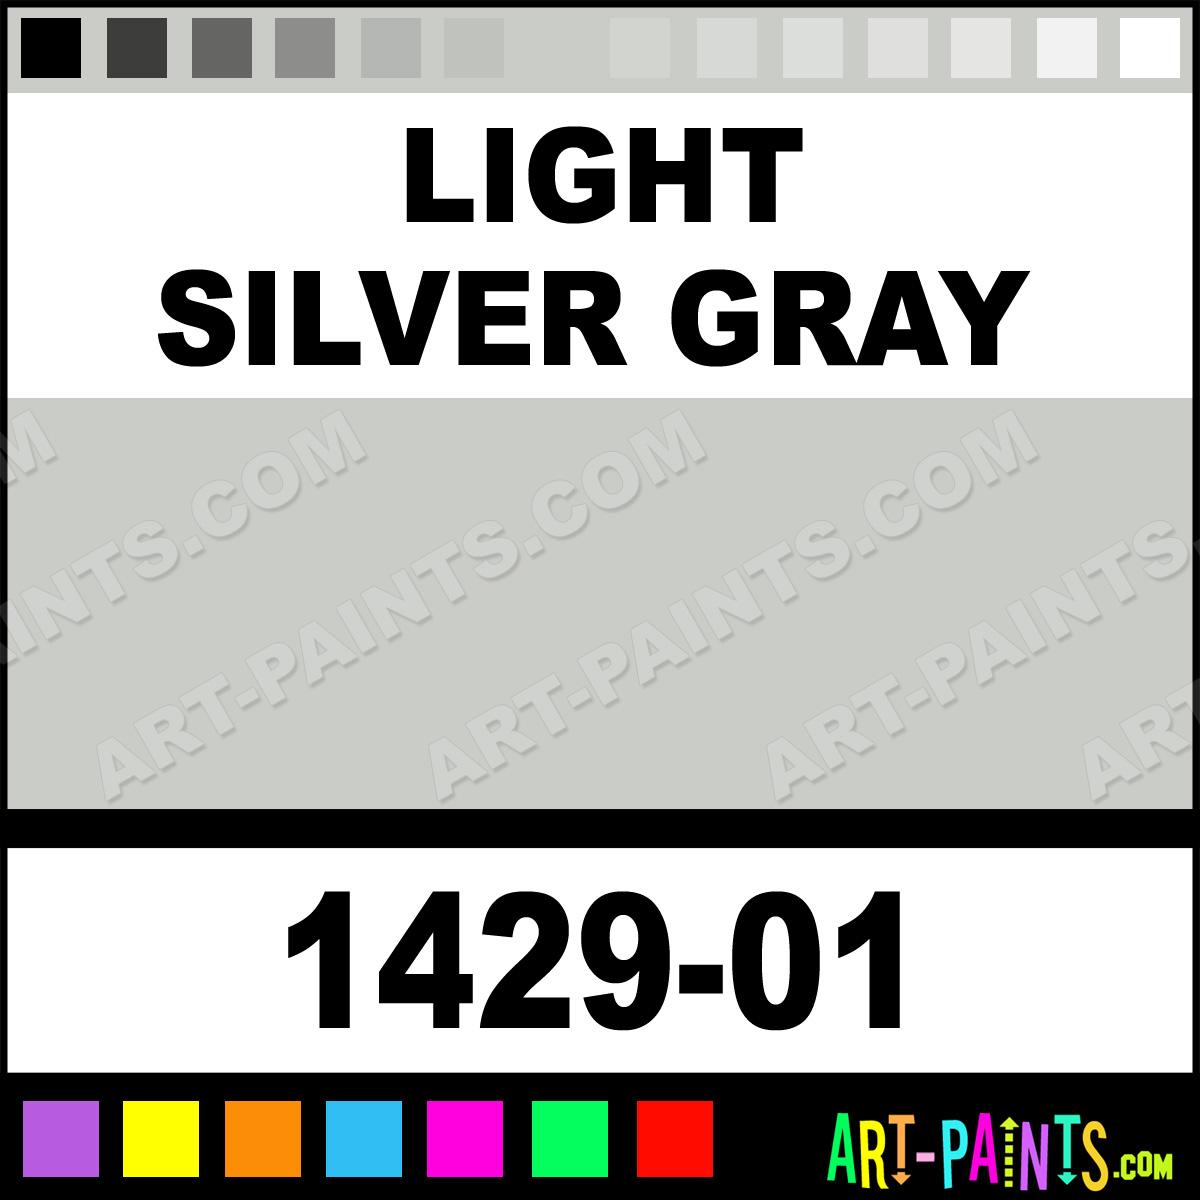 Light Silver Gray Bullseye Transparent Frit Stained Glass